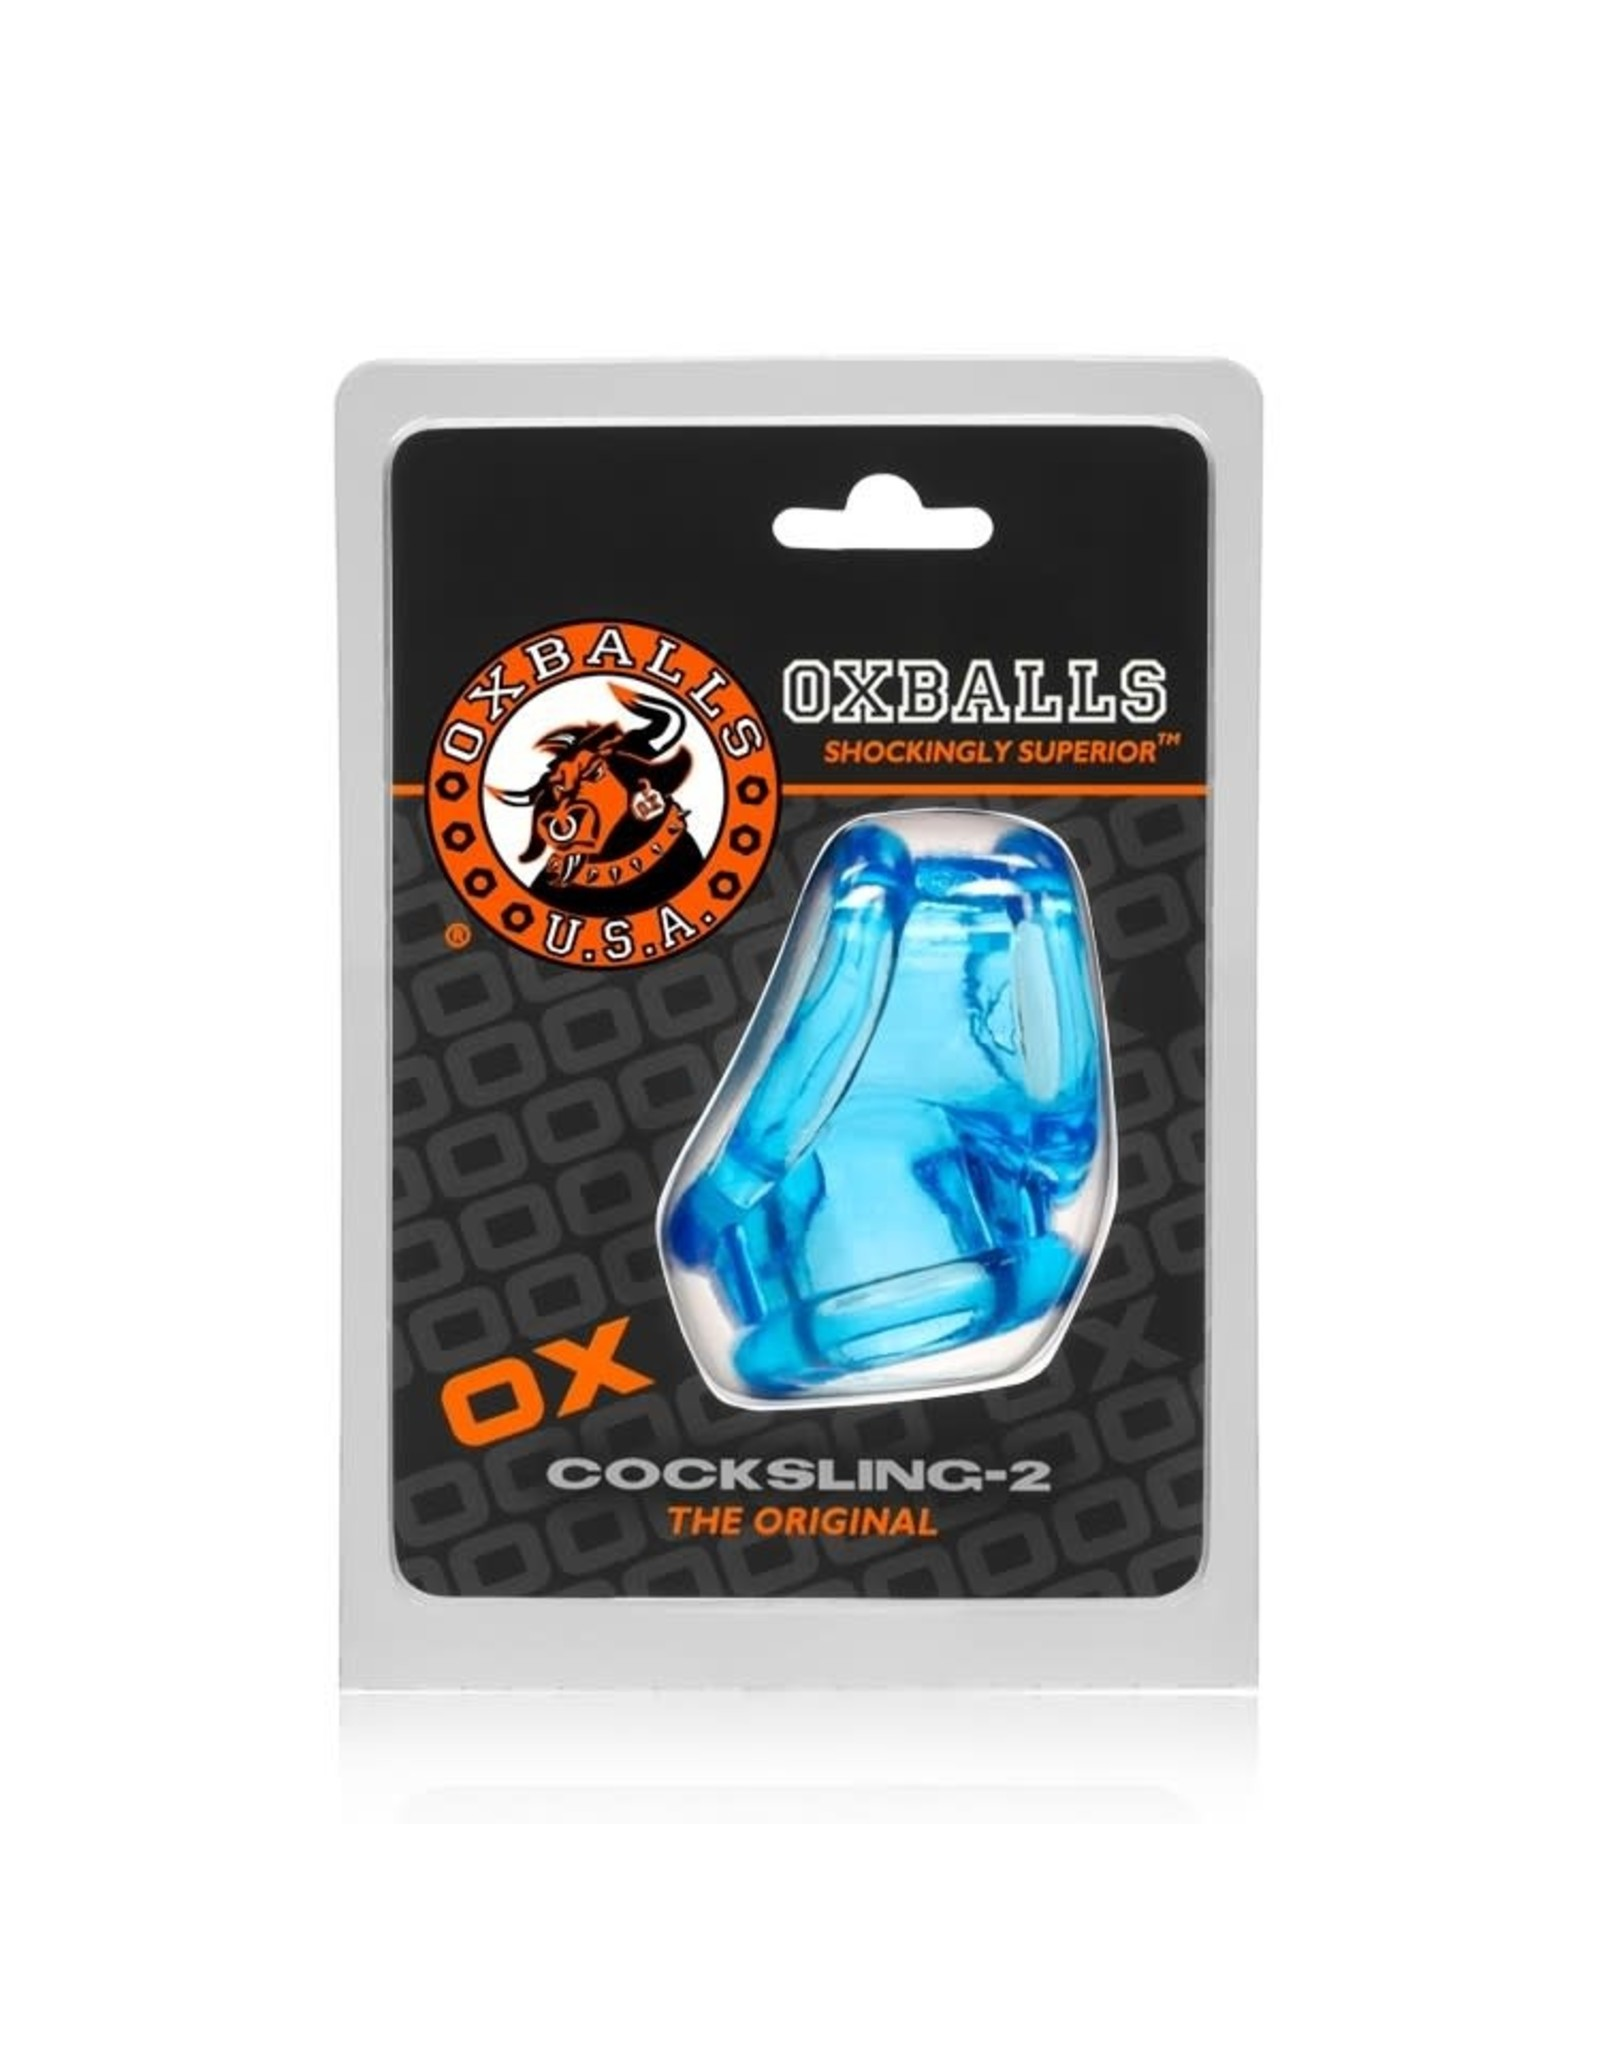 Oxballs Oxballs Cocksling-2